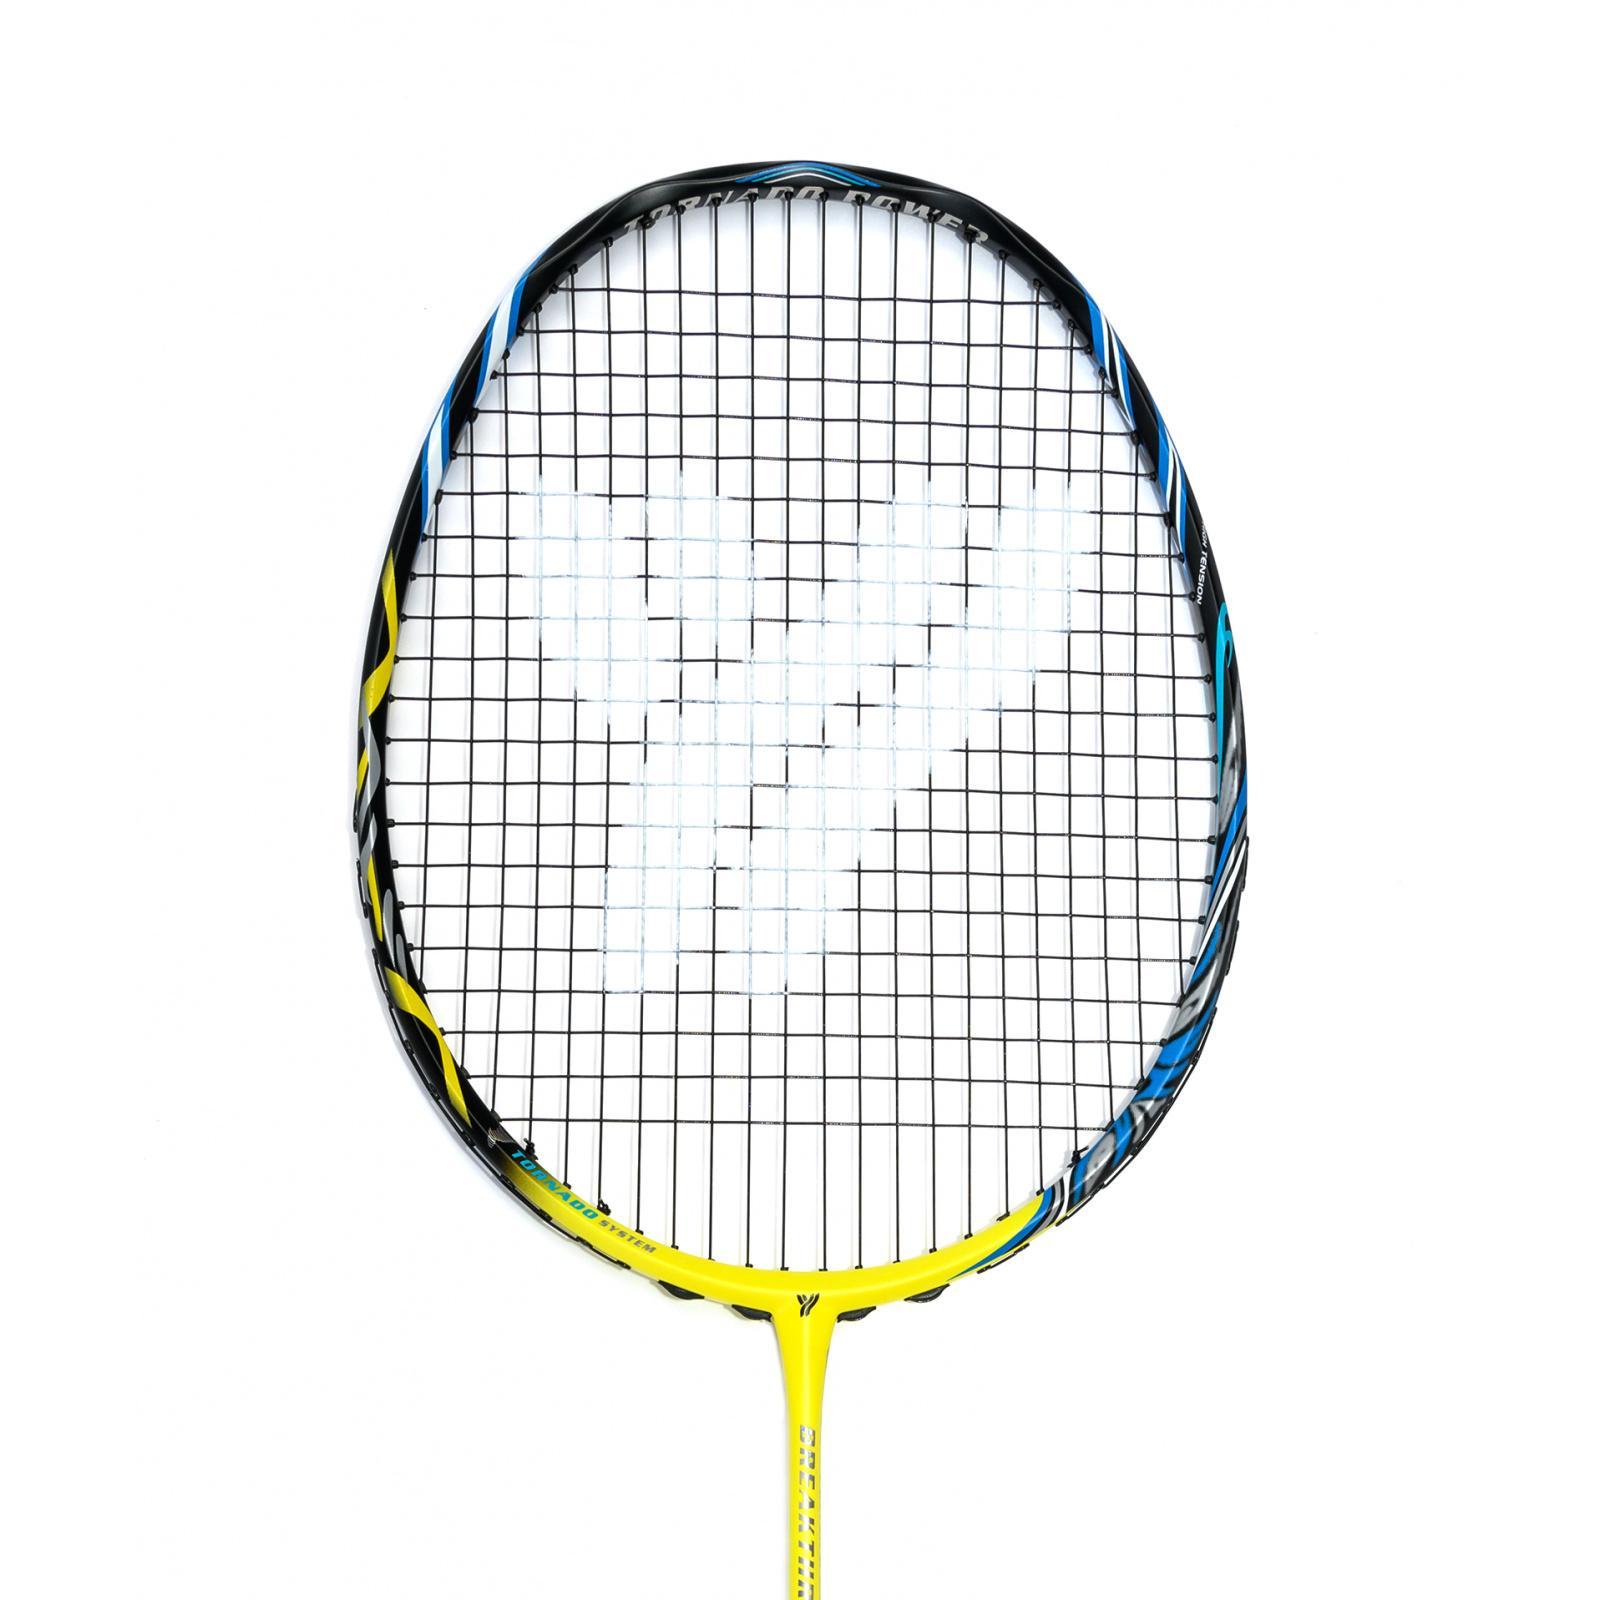 https://www.badec.store/produkty_img/badmintonova-raketa1569339061L.jpg